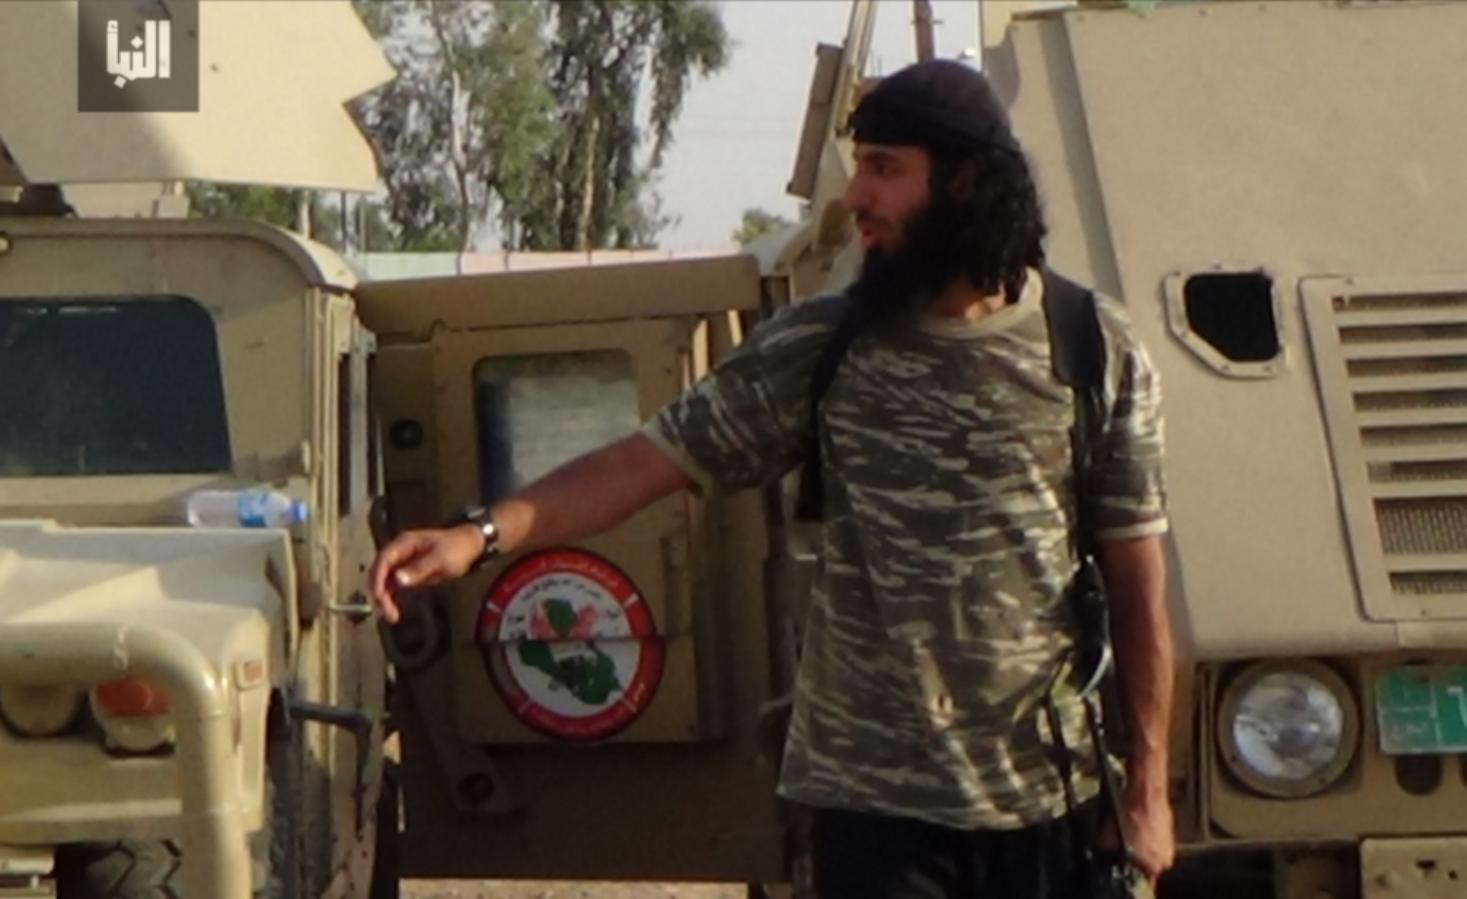 Mohammed Emwazi, better known as Jihadi John